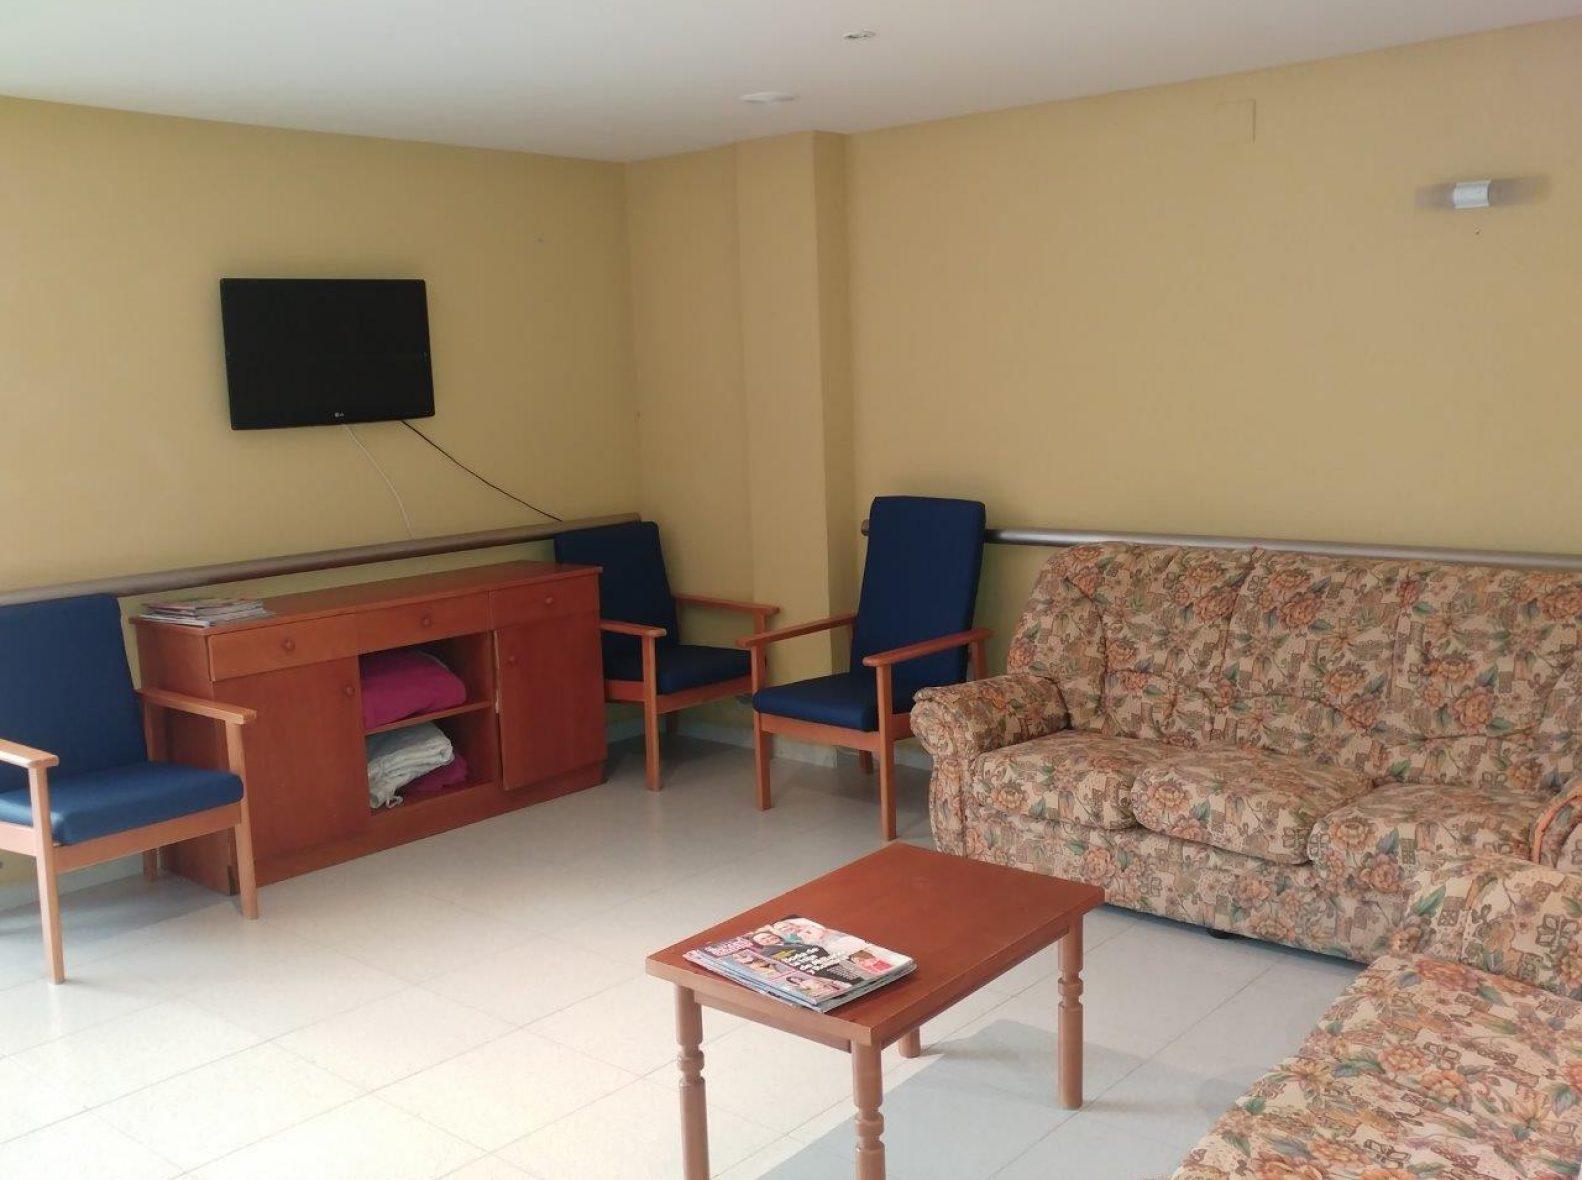 residencia1